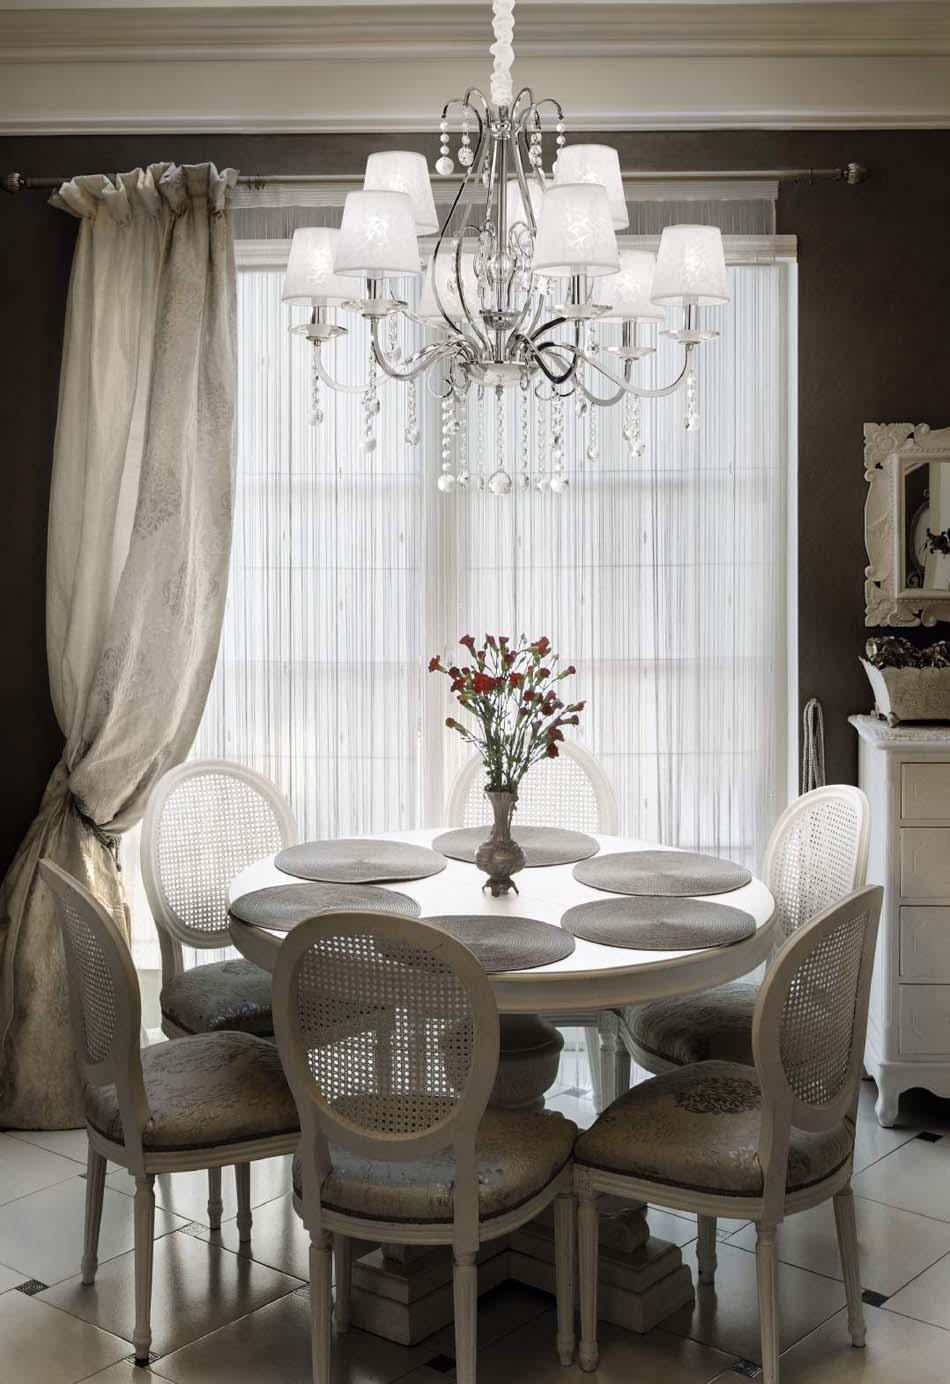 Lampade 38 sospese vintage Ideal Lux Senix – Toscana Arredamenti